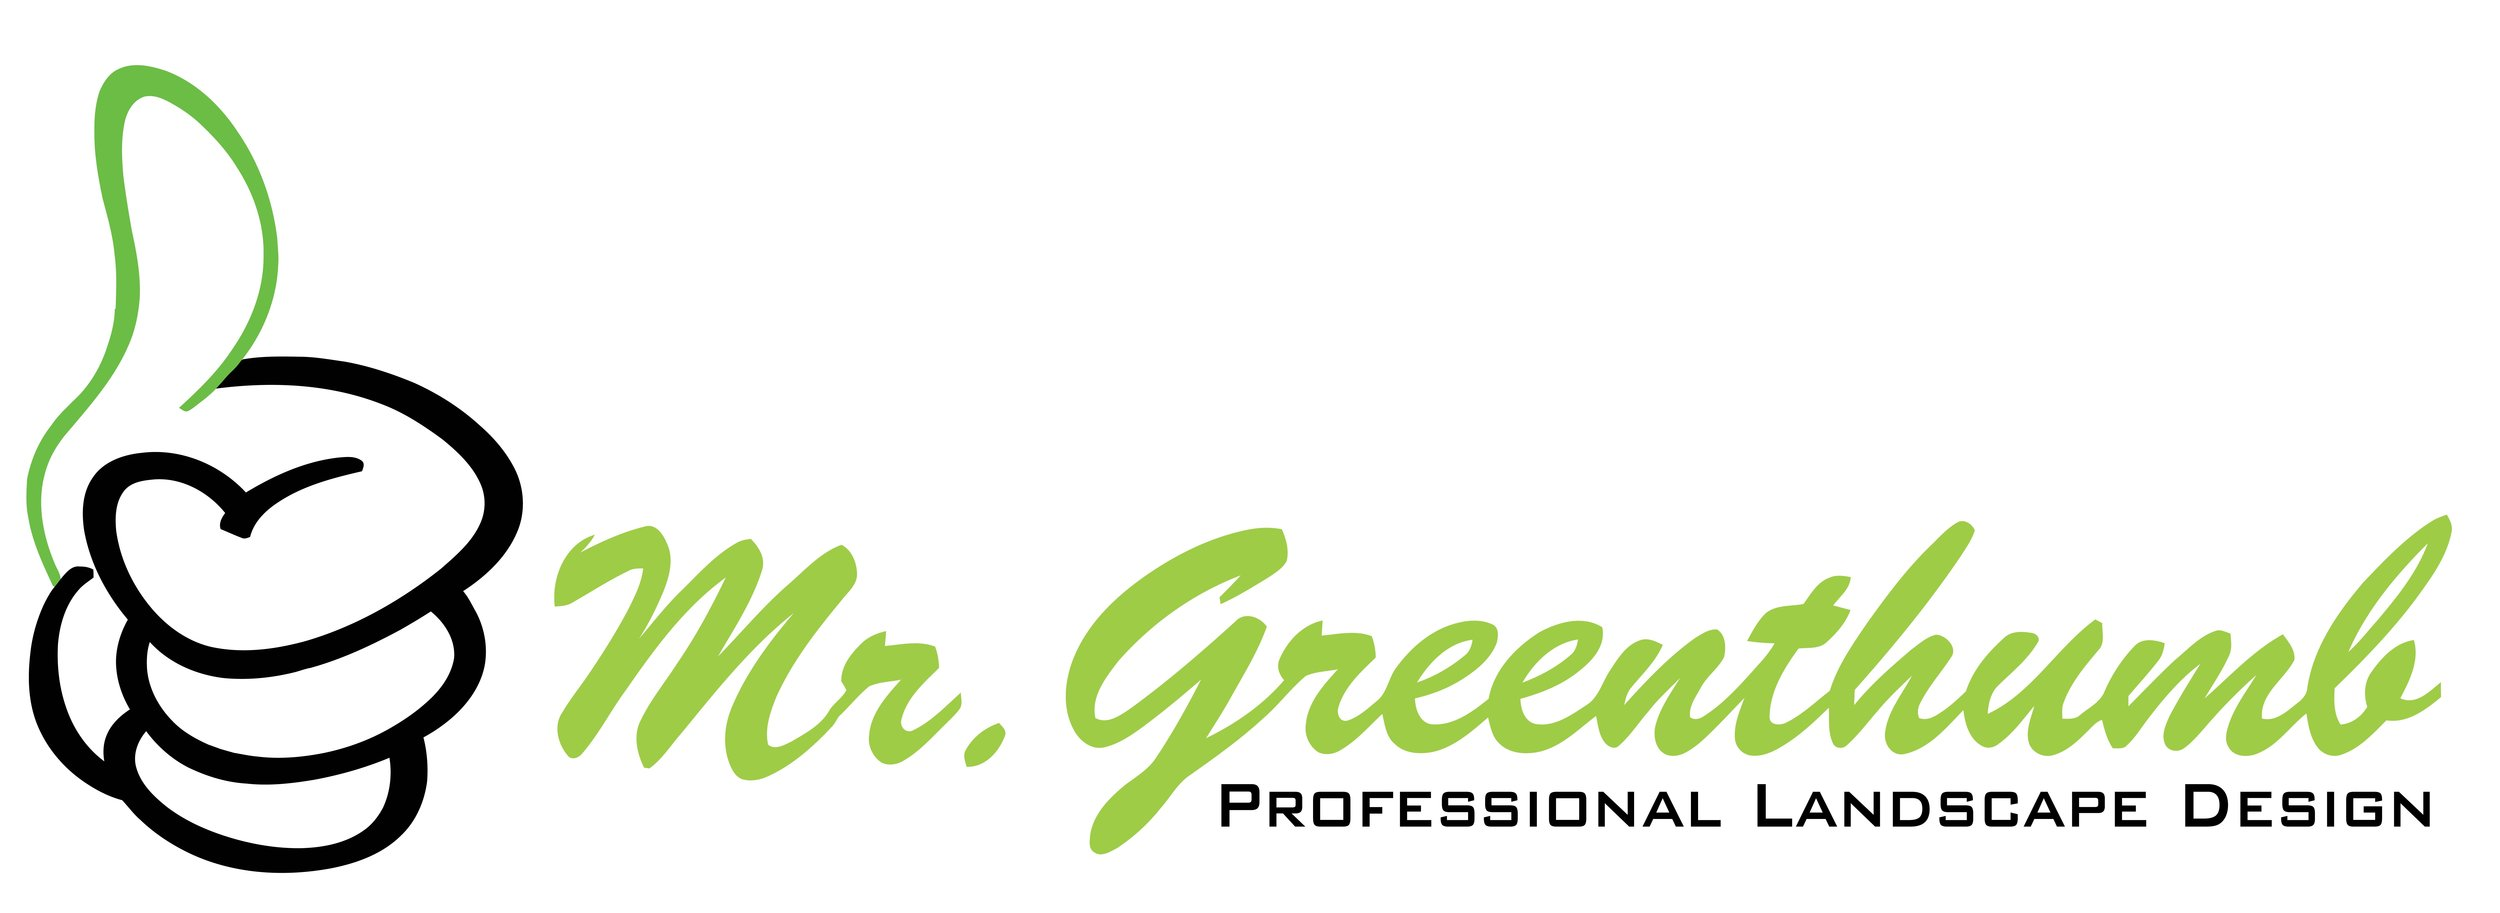 greenthumb (1).jpg